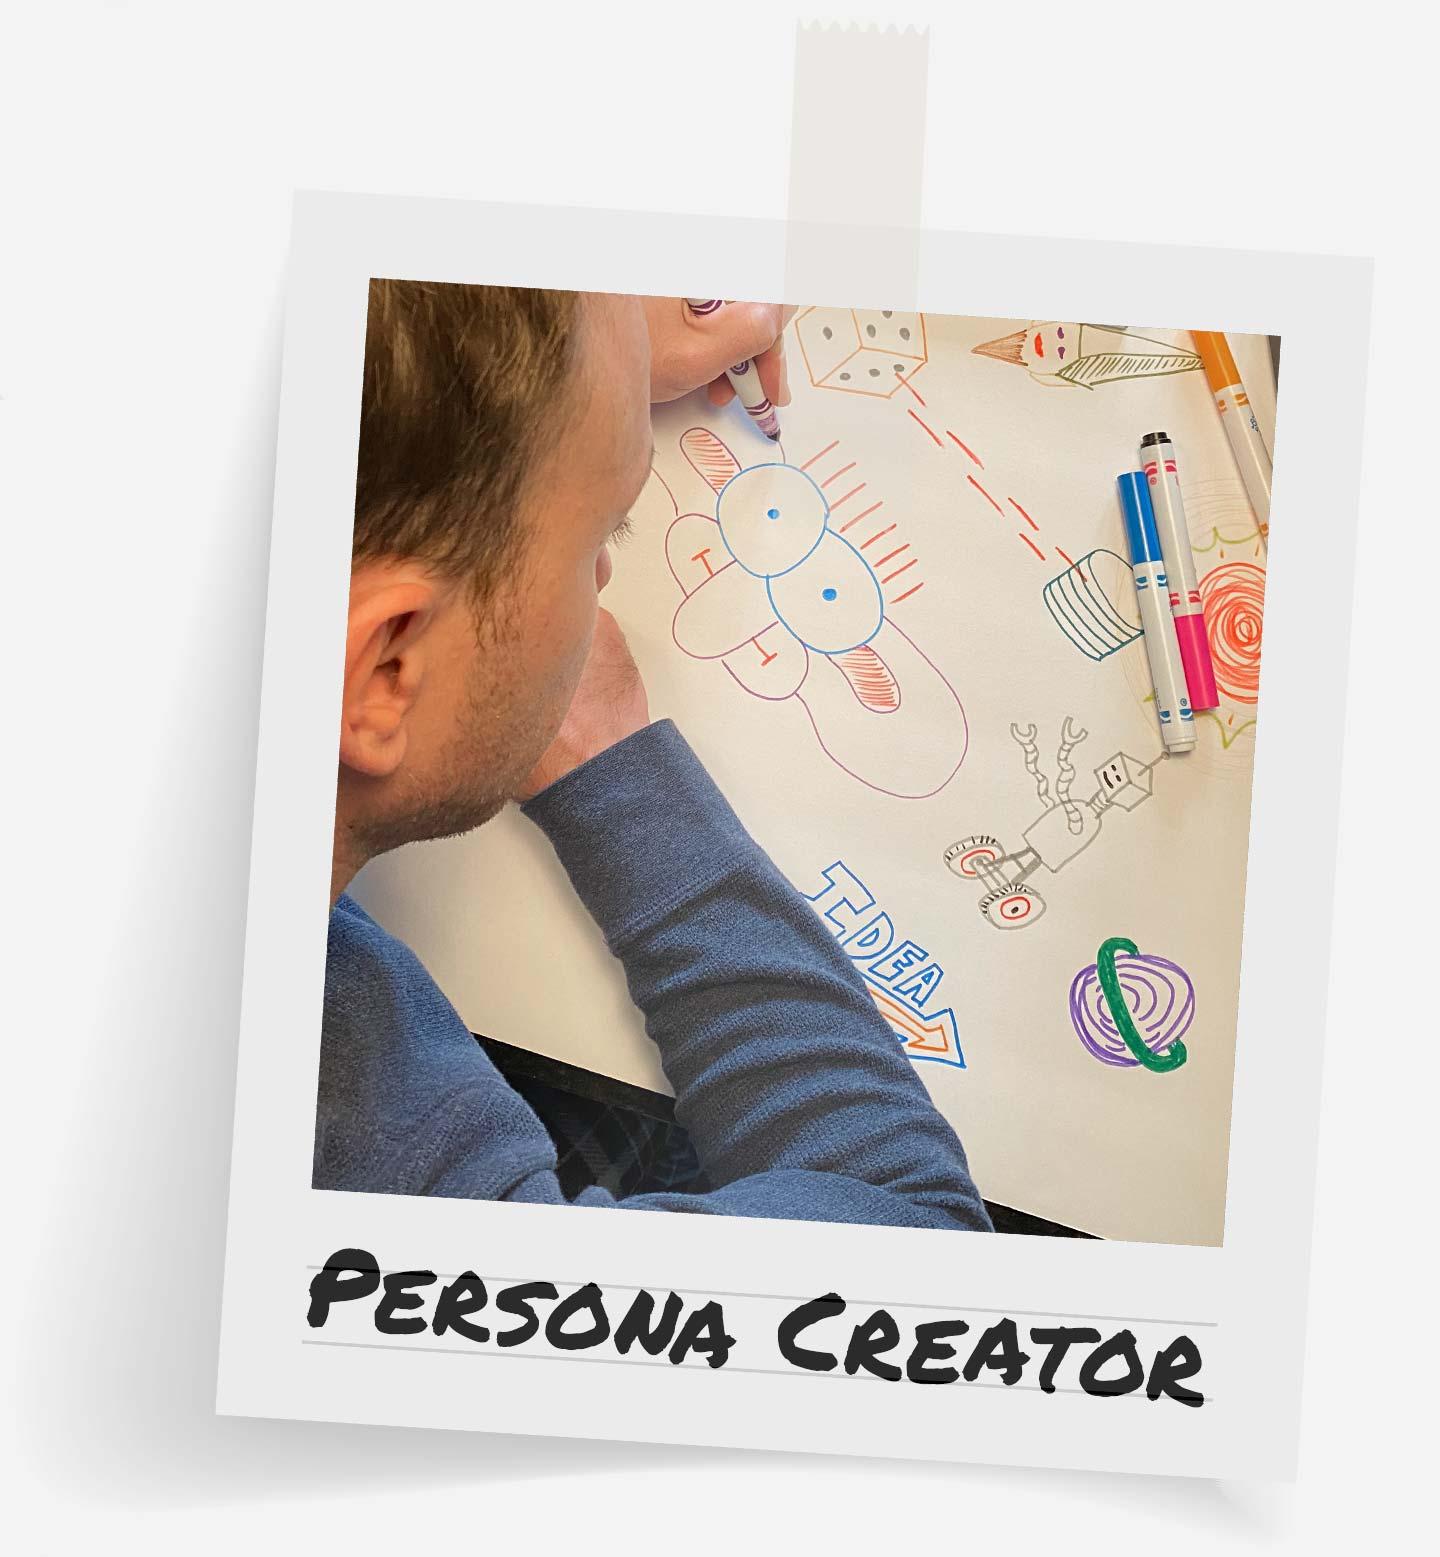 personaCreator